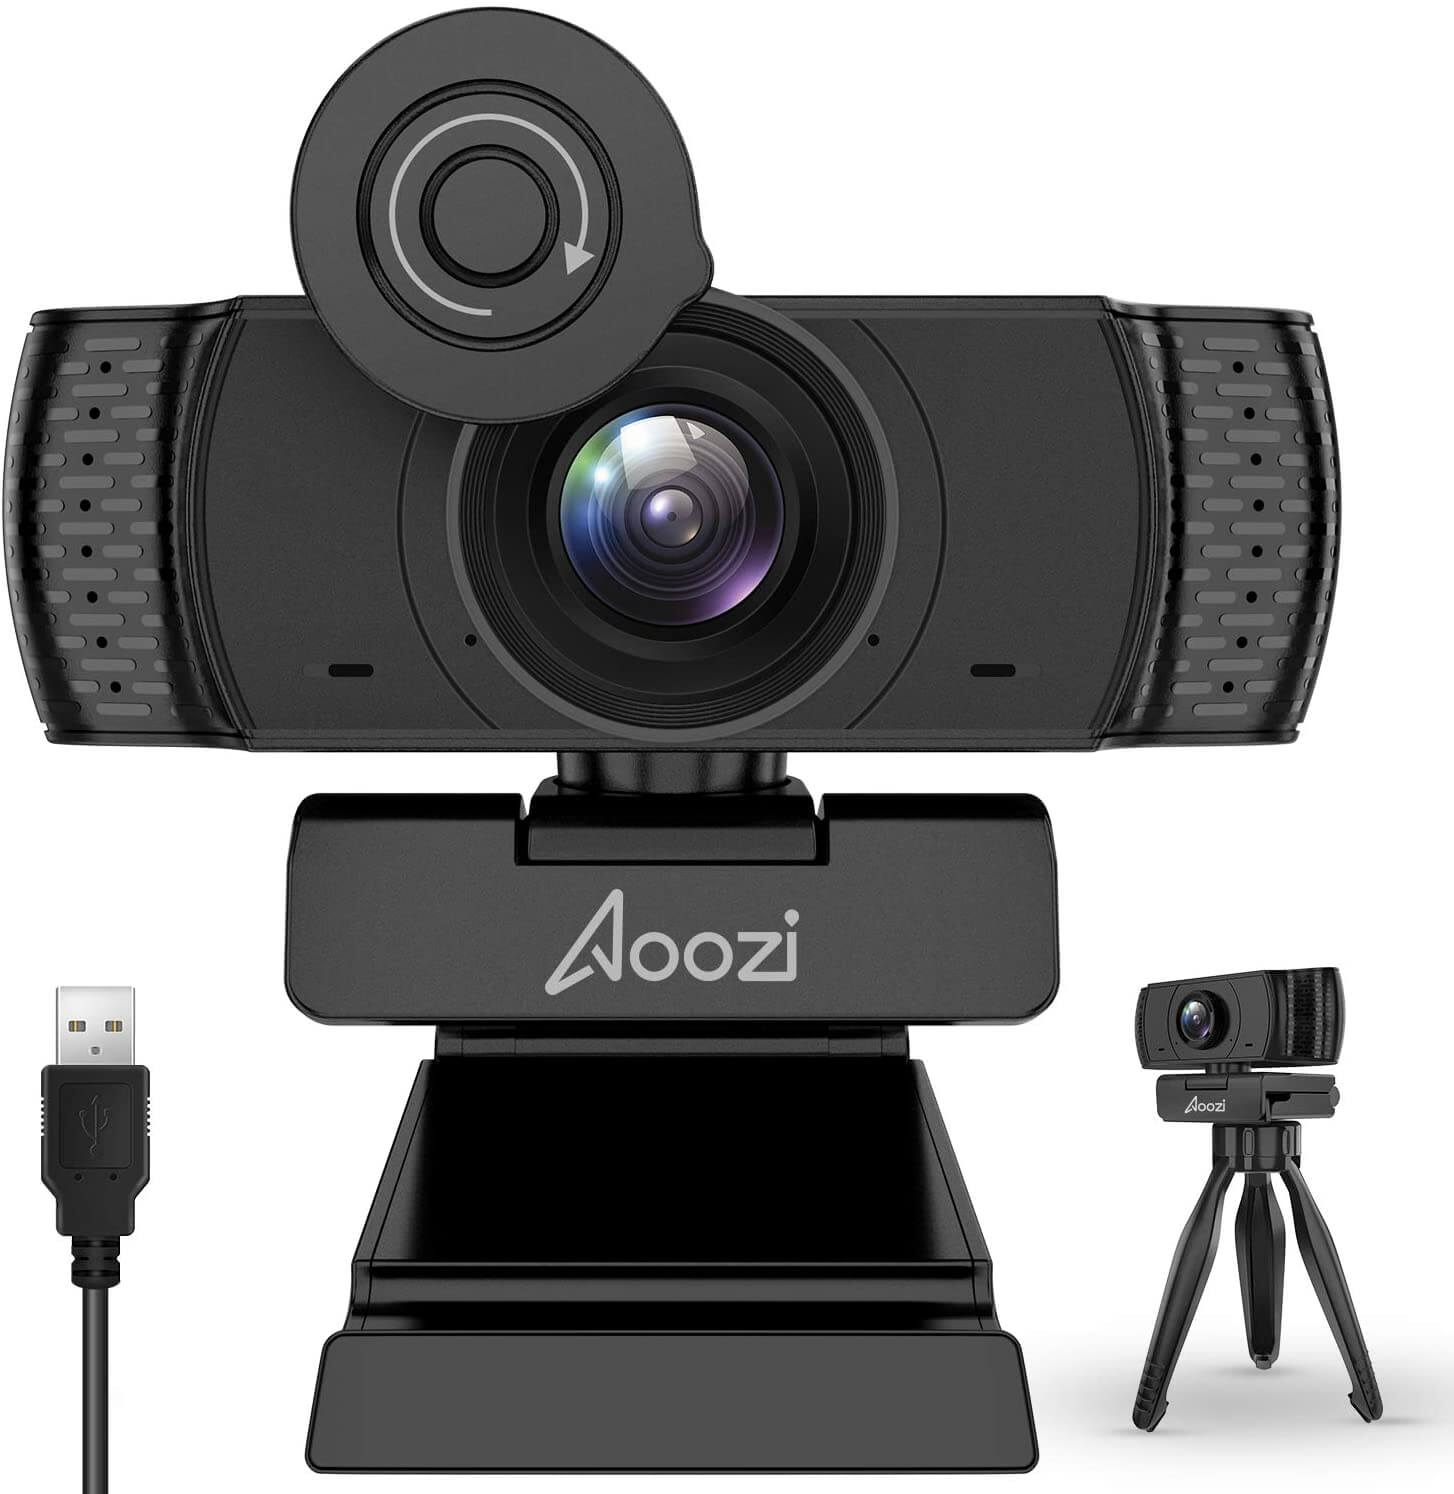 Aoozi Webcam